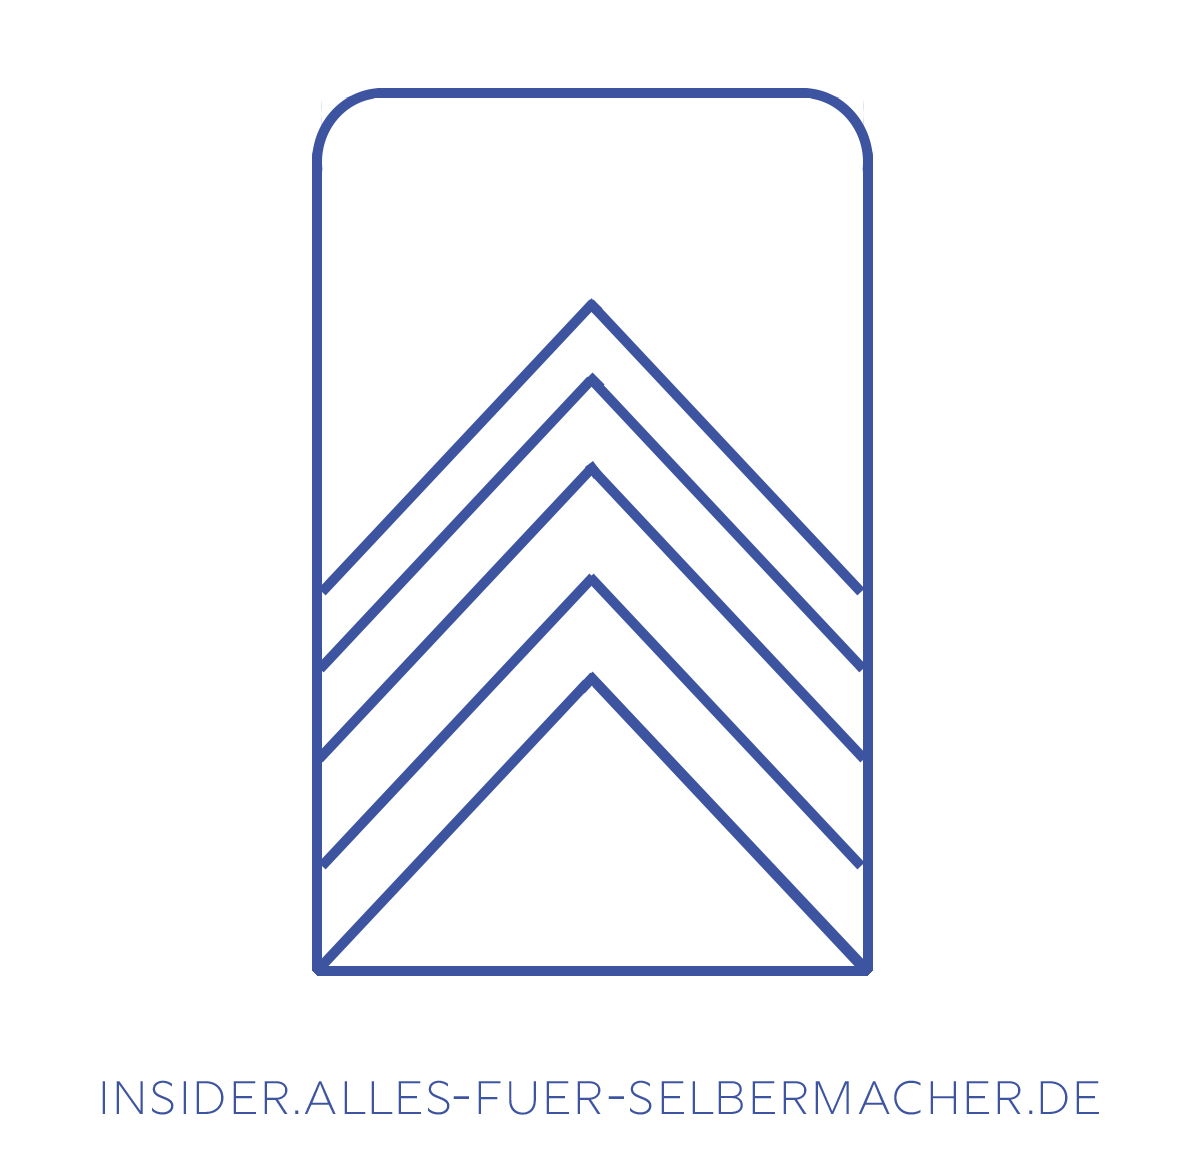 Charmant Blogger Leere Vorlage Bilder - Entry Level Resume Vorlagen ...